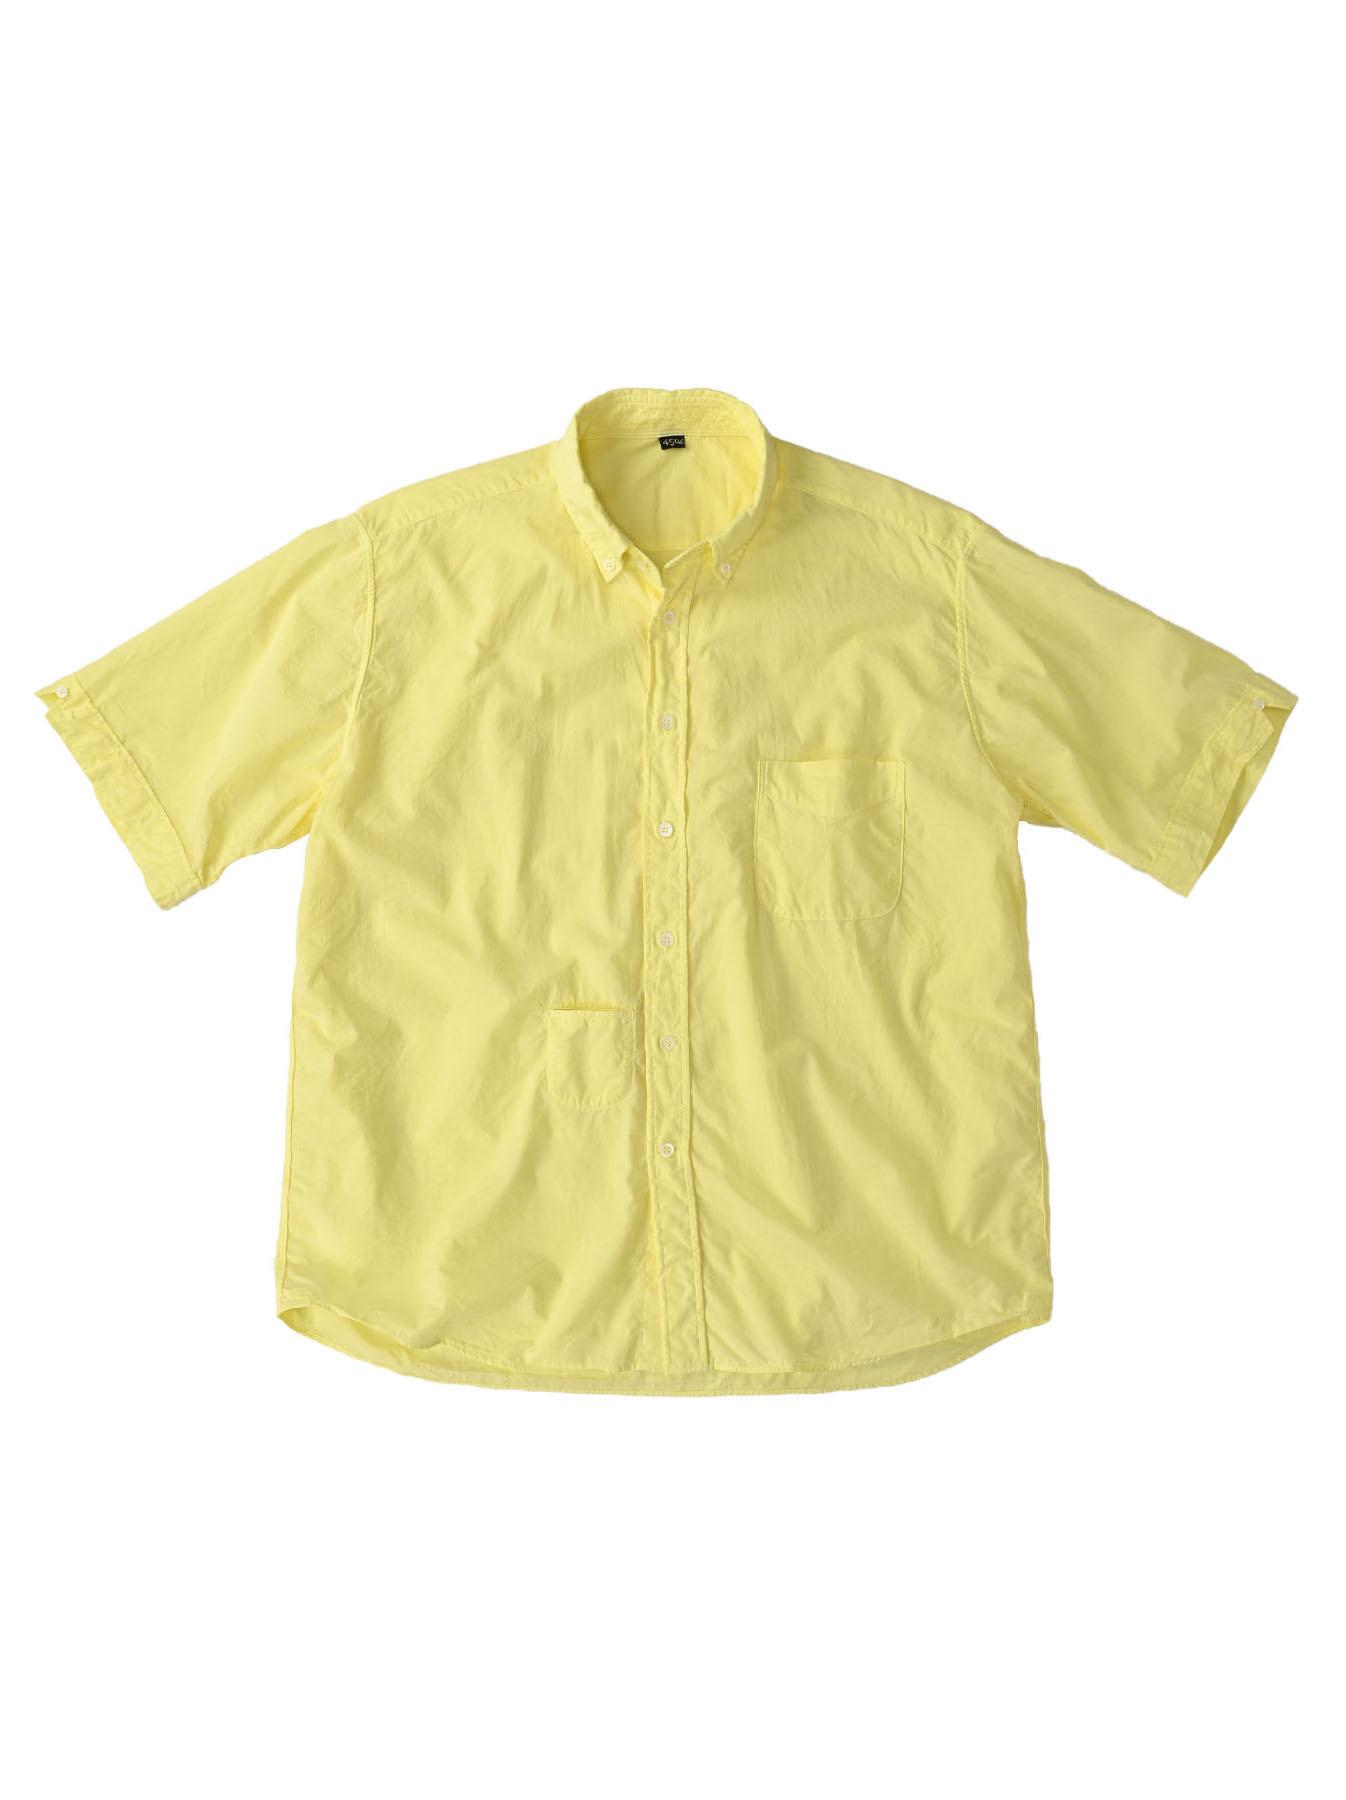 Damp Cotton Anuenue Ocean Shirt (0621)-3